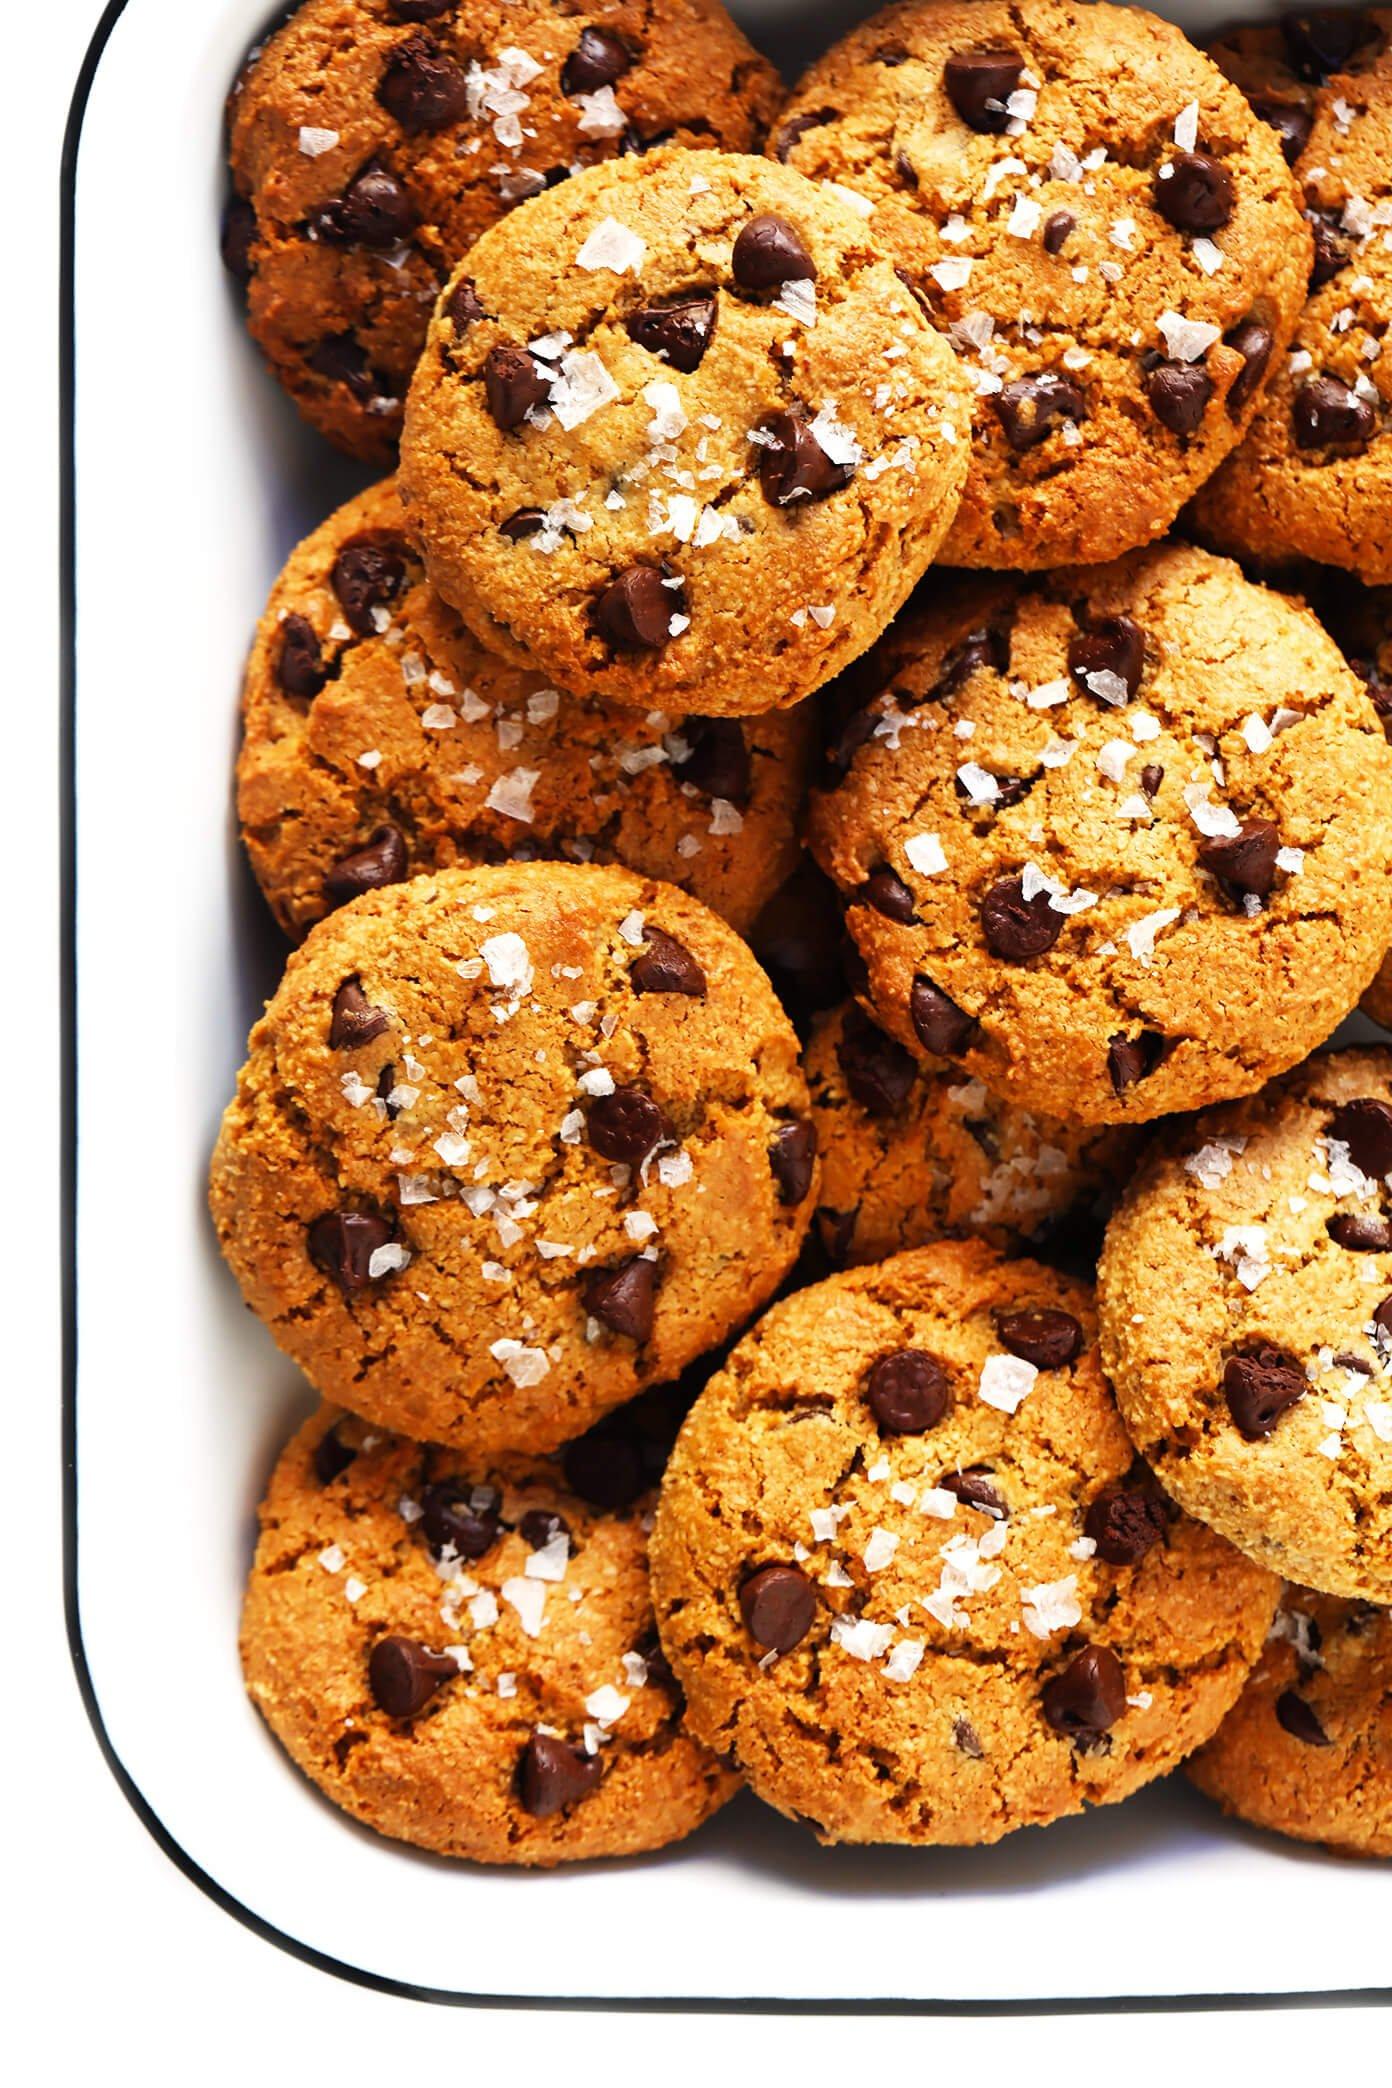 Chocolate chip cookie - Wikipedia